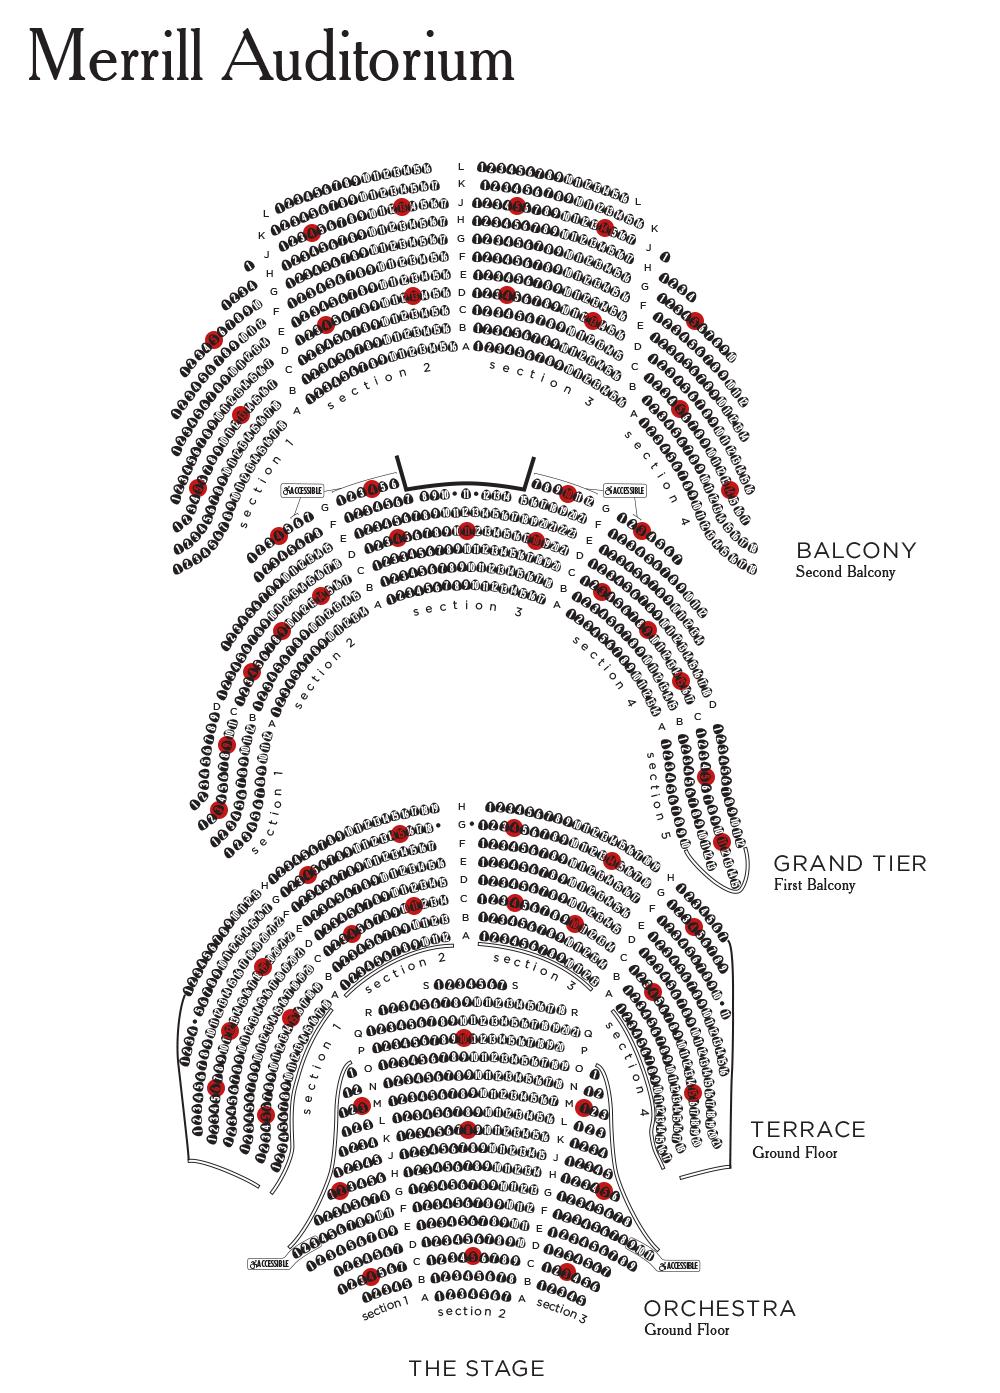 Merrill Auditorium Seating Chart Jerry Seinfeld Tickets